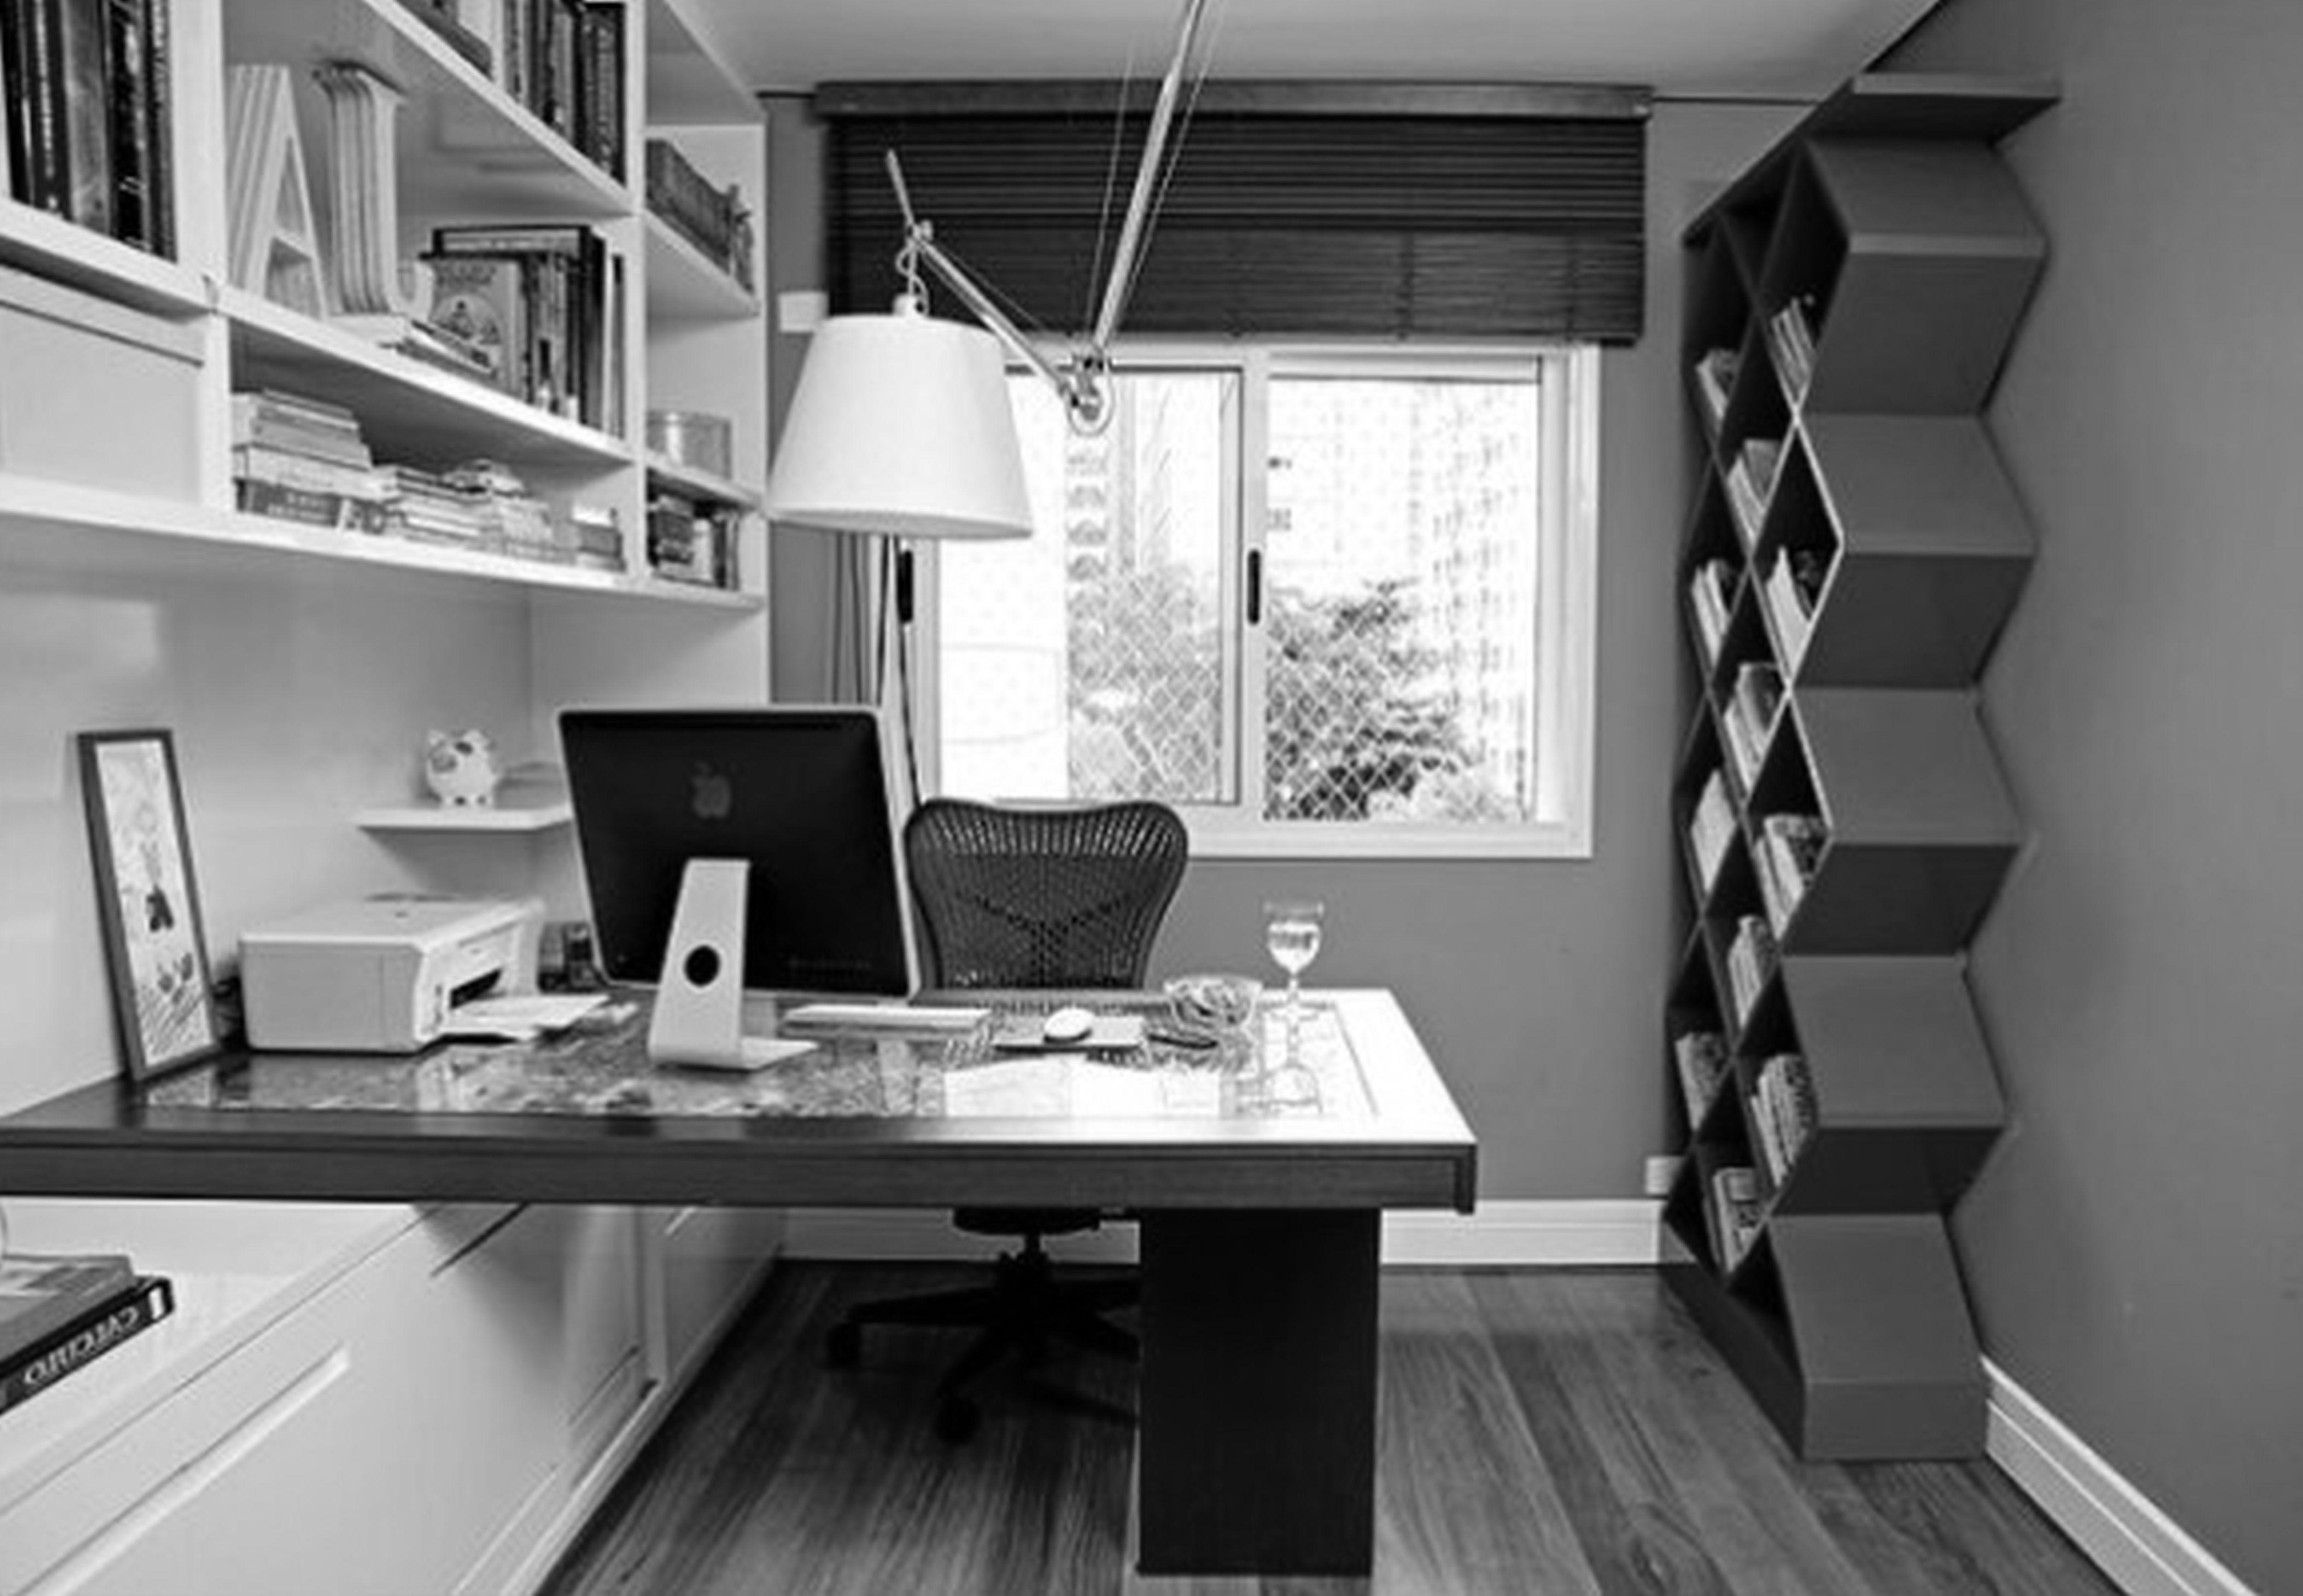 Captivating New Home Design Ideas Object Handsome Home Design Ideas Website  Seductive Instruments Presentation, Small Home Office Design Ideas Bookcase  ...